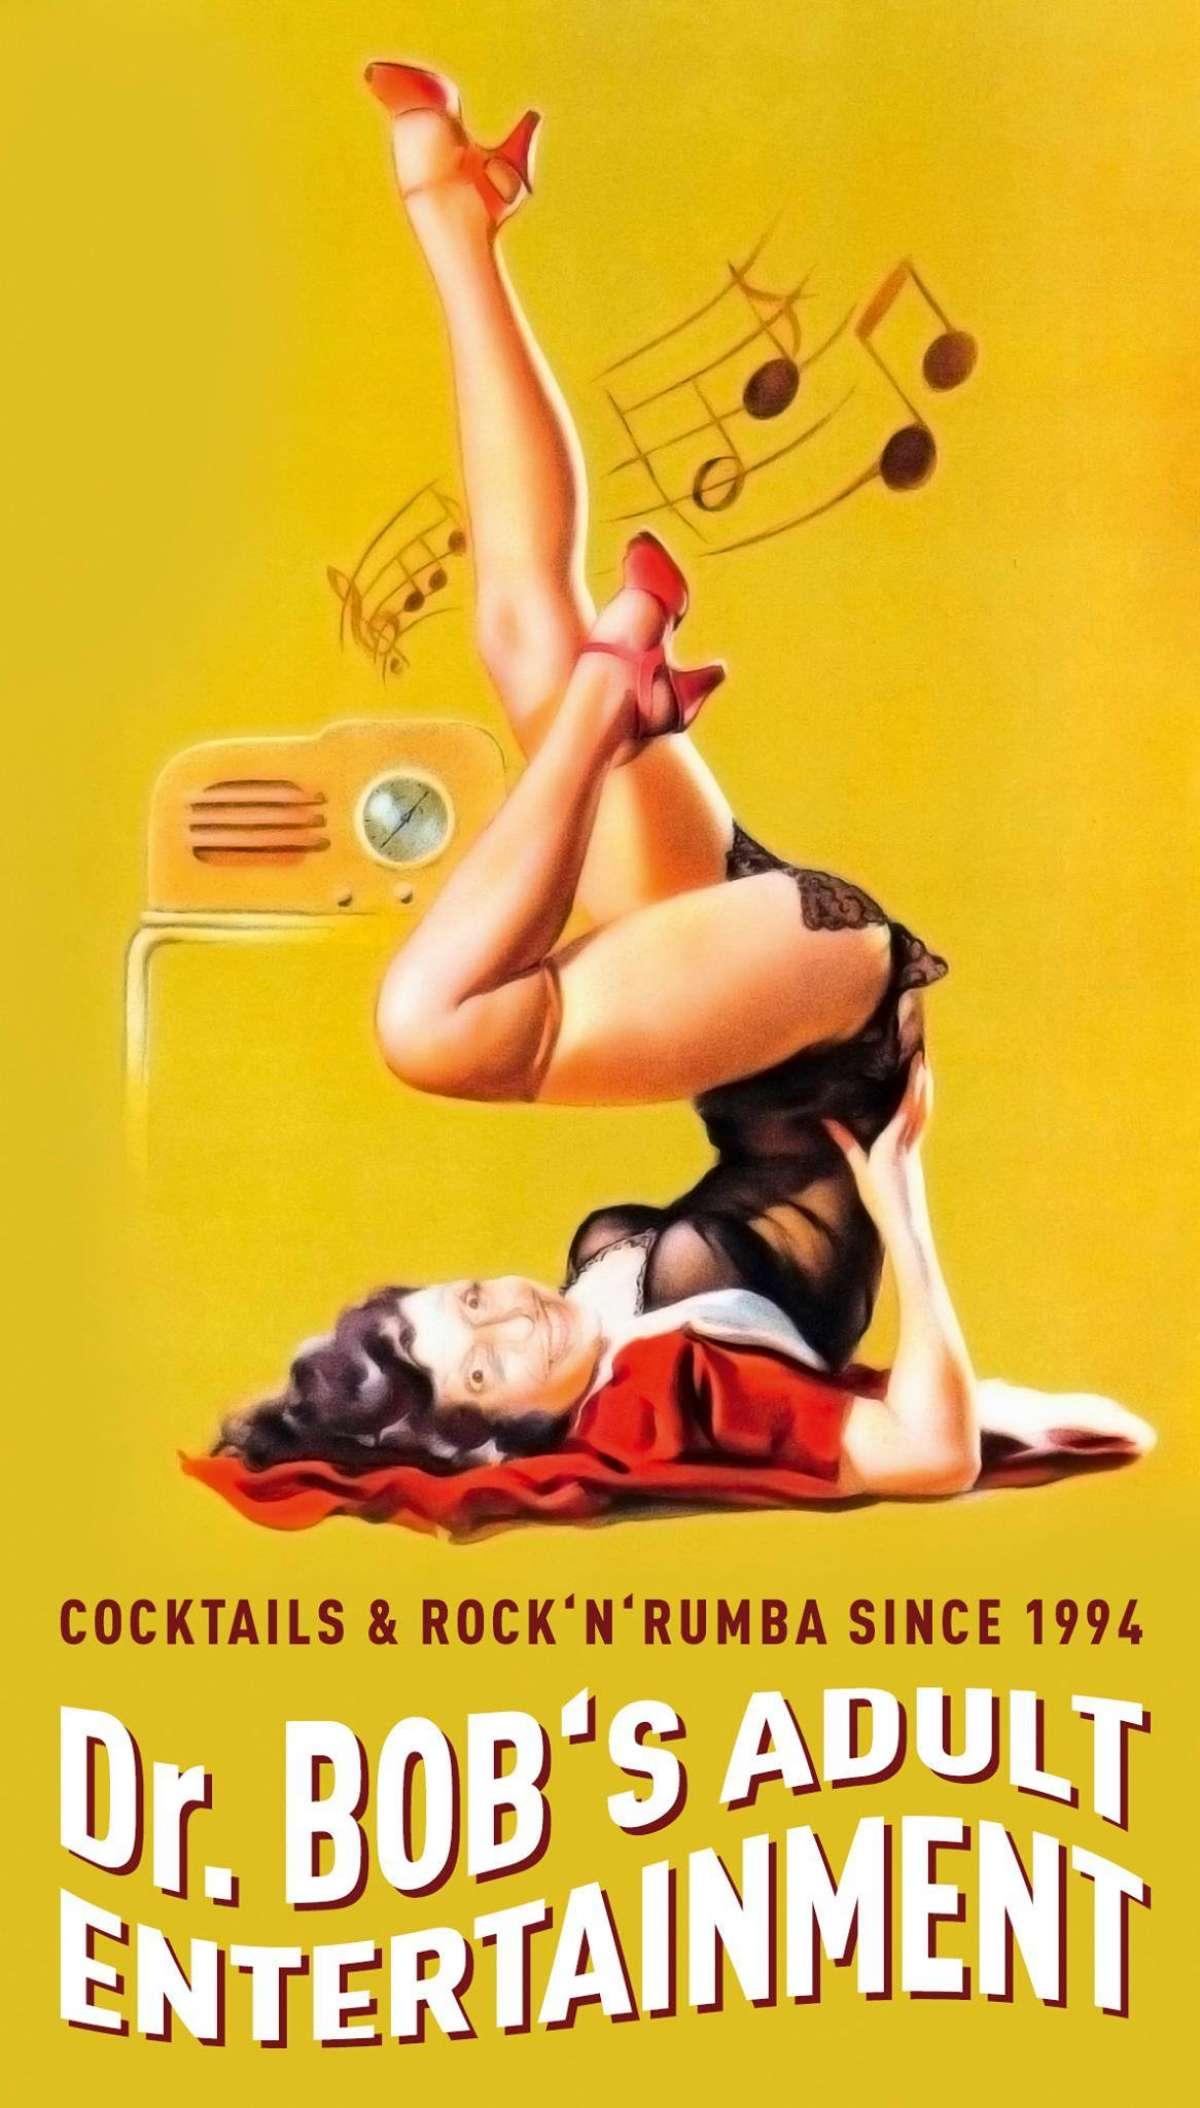 Bob's Adult Entertainment ABGESAGT - Lolita Bar - Kassel